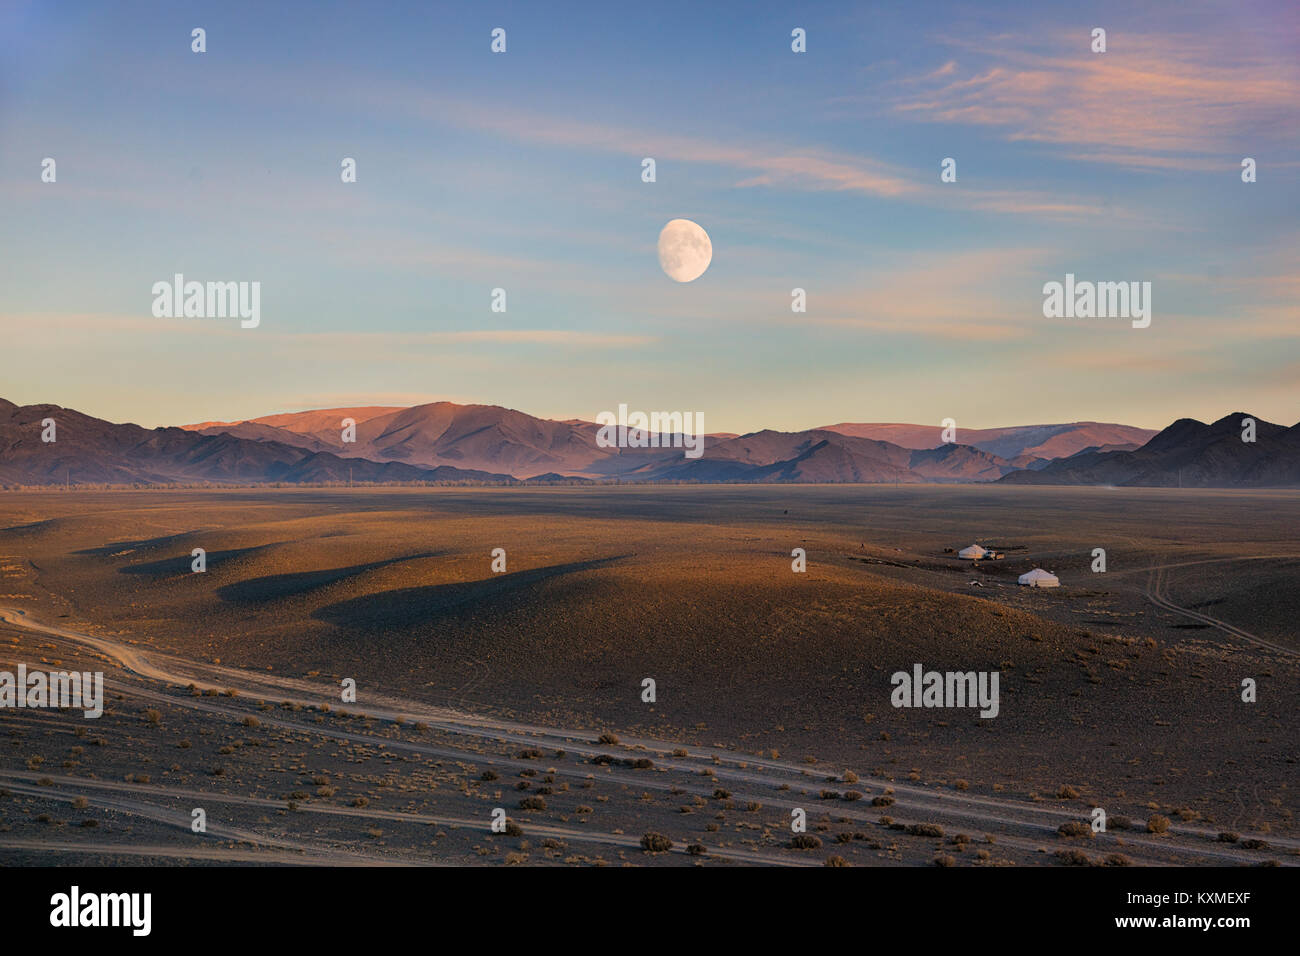 Mongolian sunset moon gers landscape steppes grasslands dirt roads golden hour - Stock Image